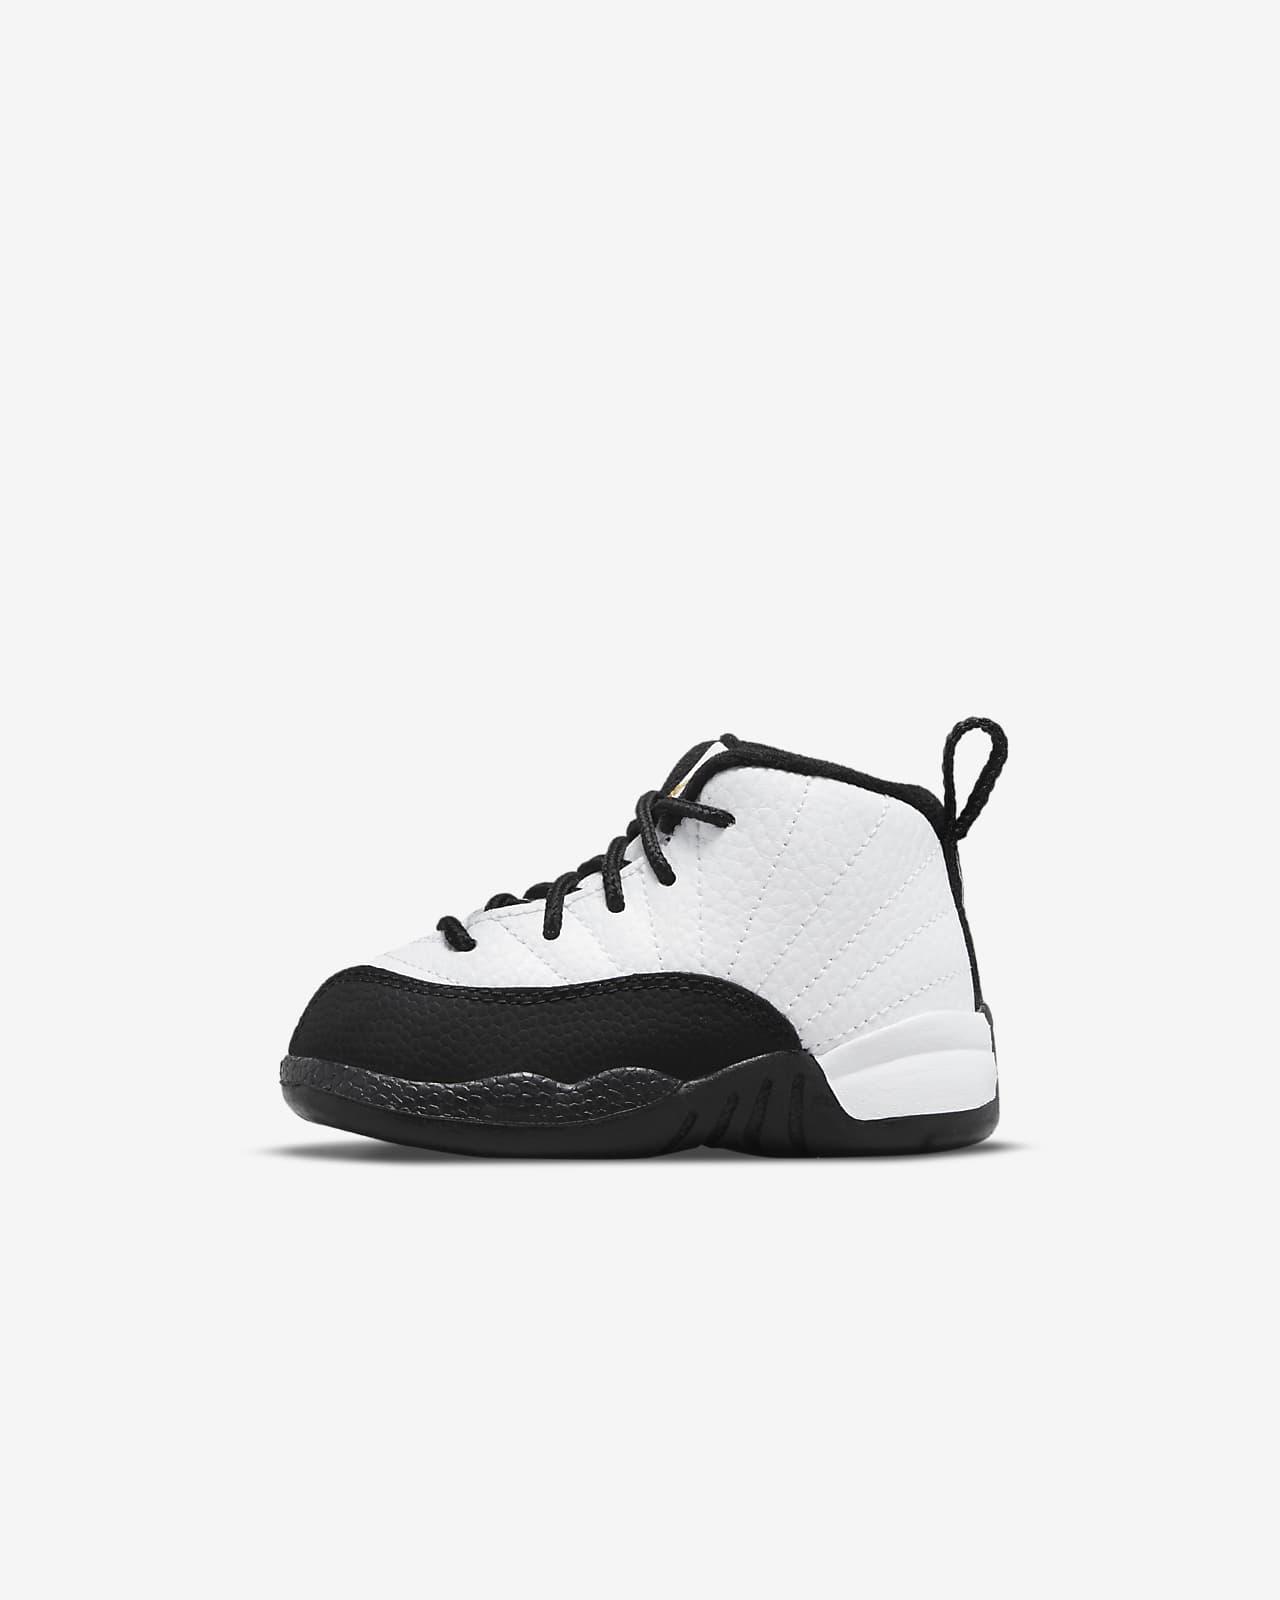 Jordan 12 Retro (TD) 复刻婴童运动童鞋